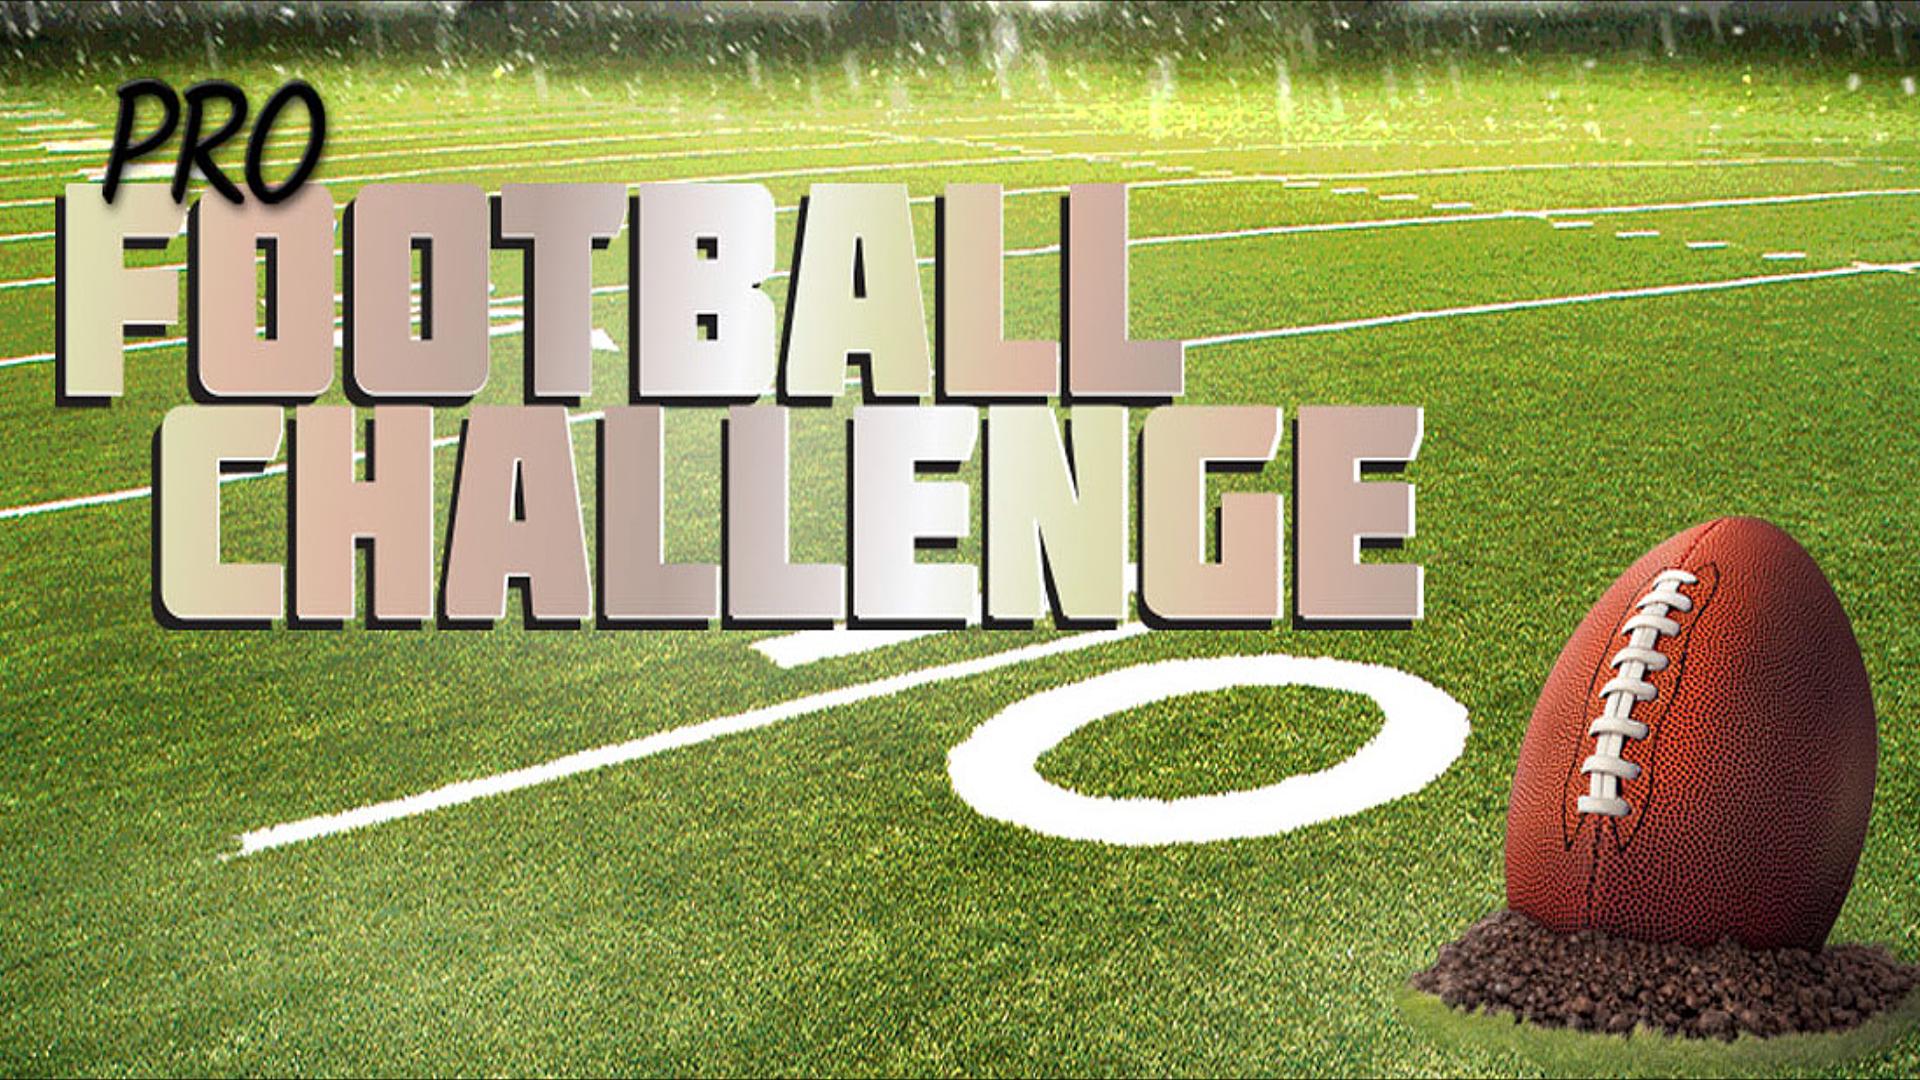 PRO FOOTBALL CHALLENGE_1538699551173.jpg.jpg